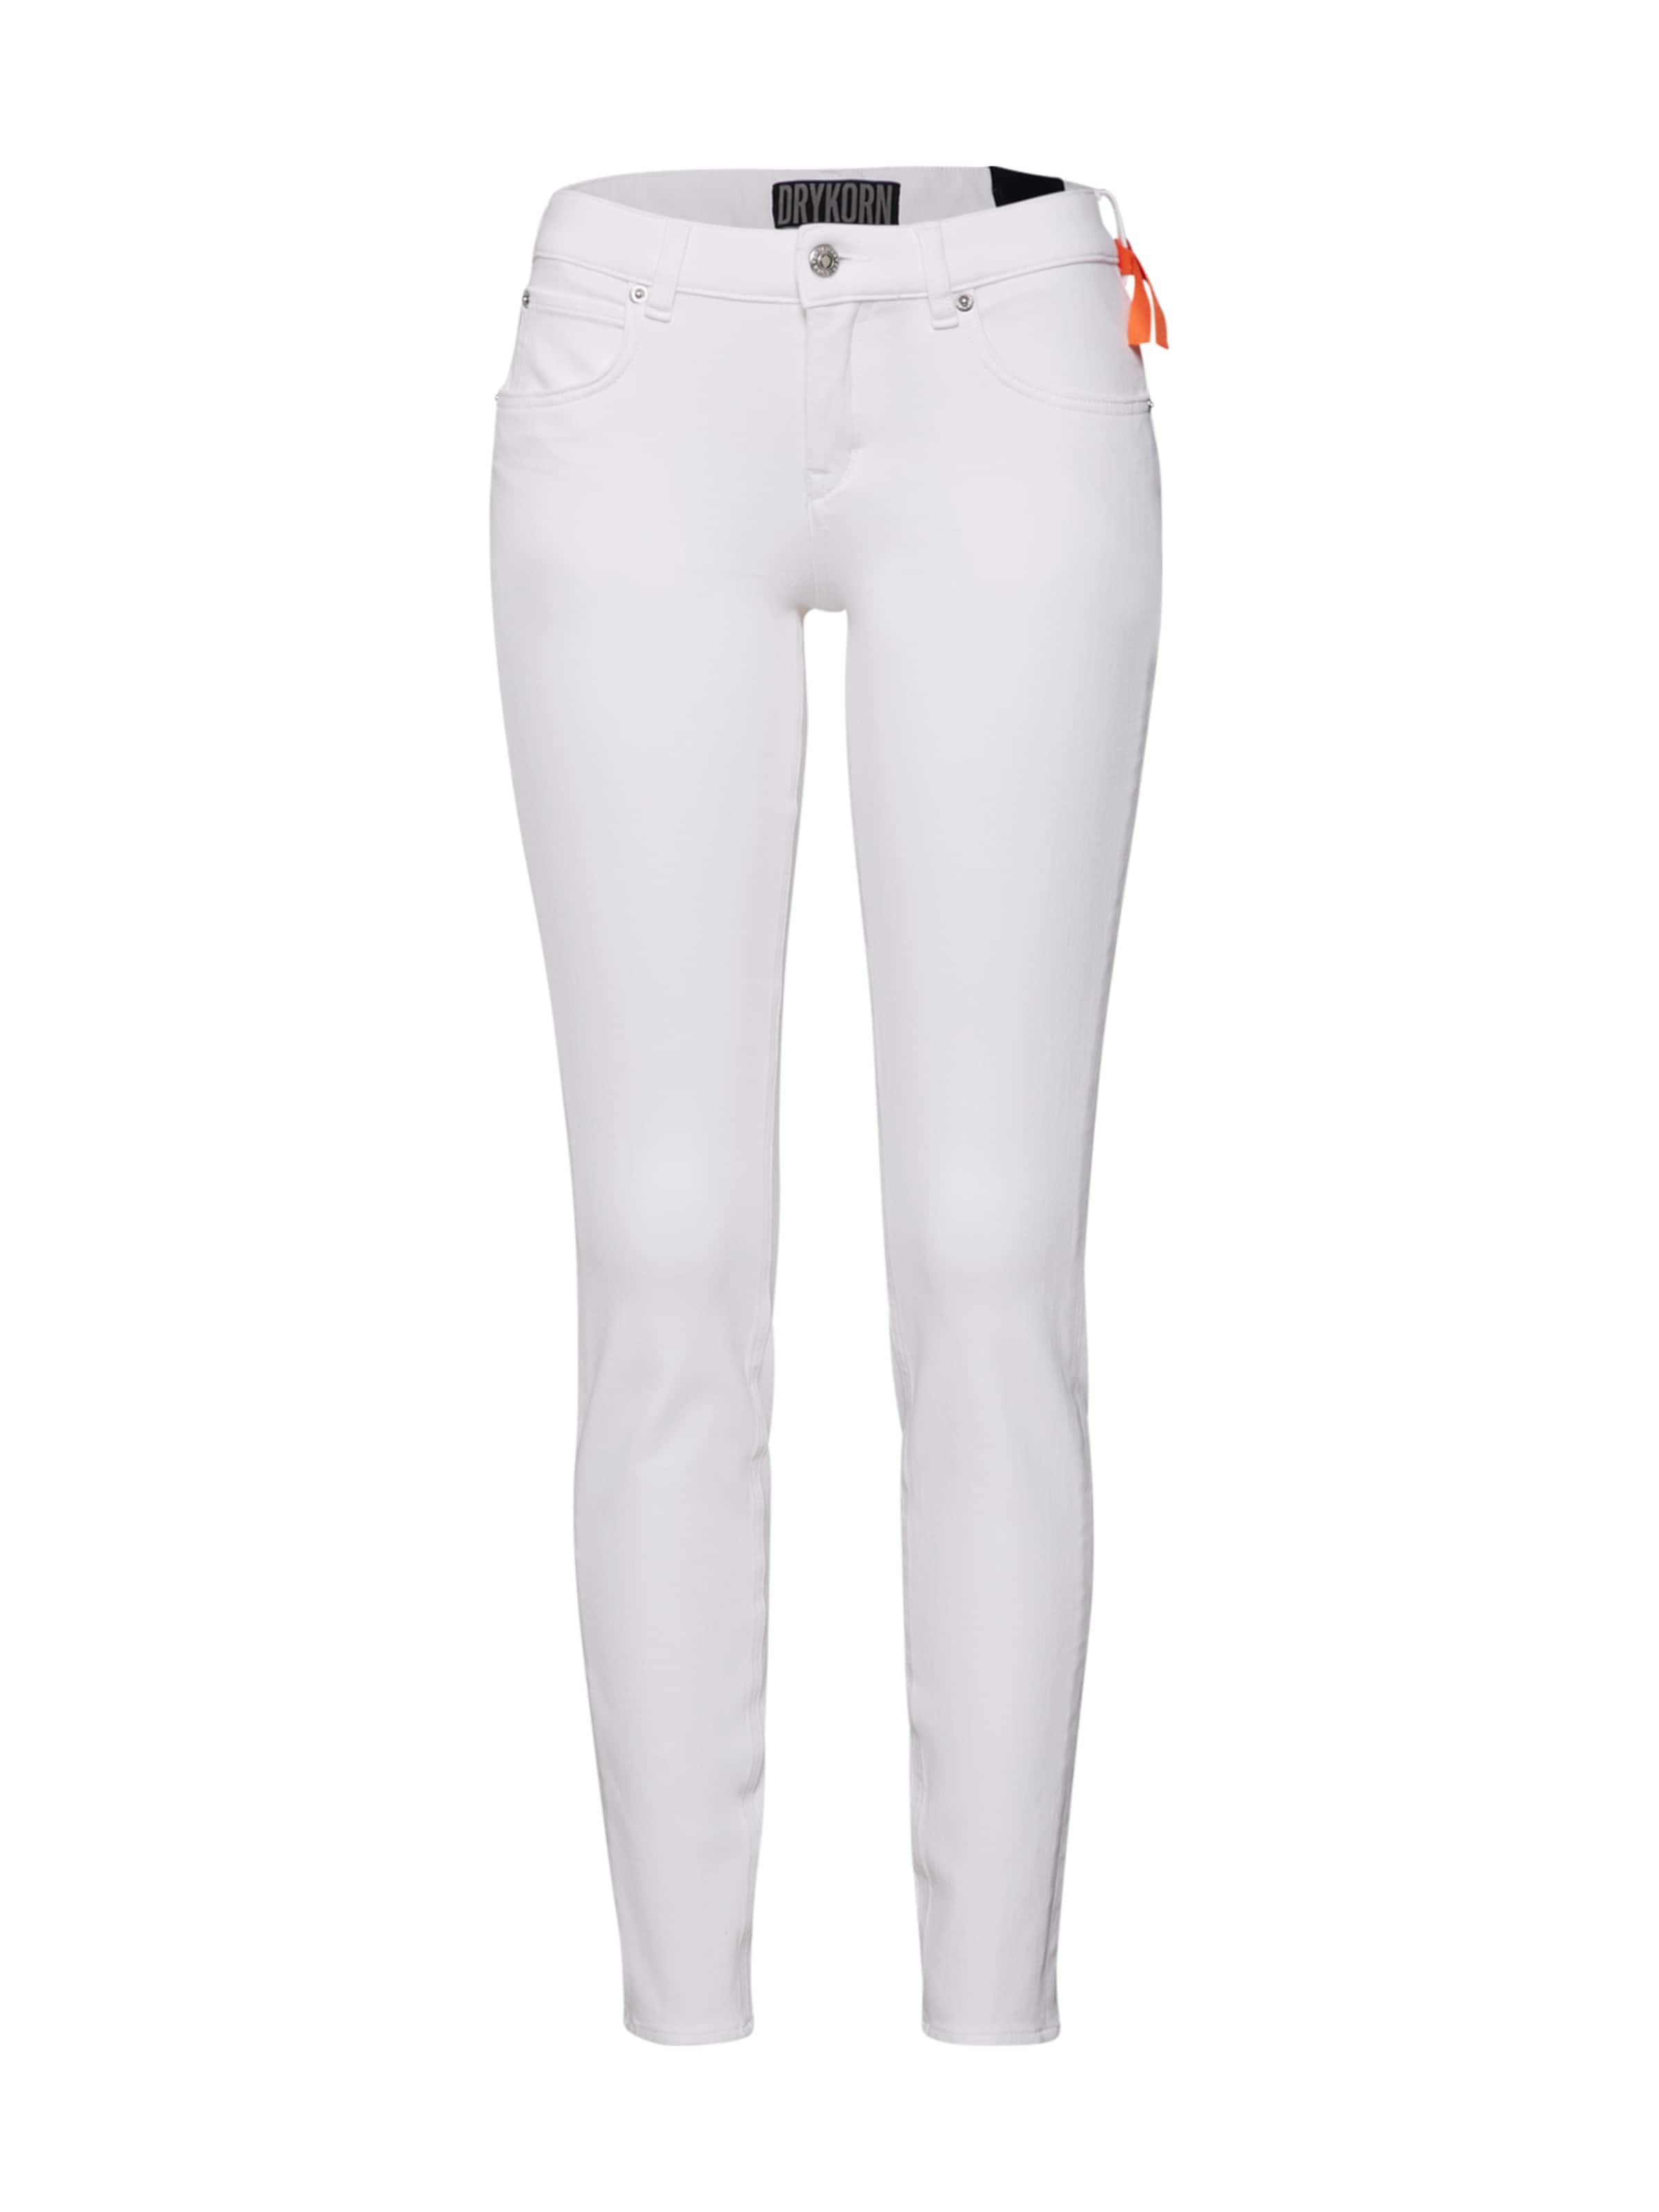 Drykorn Jeans In In Drykorn Weiß Jeans Weiß Jeans Drykorn In Weiß Drykorn In Jeans PuOZTwiXk